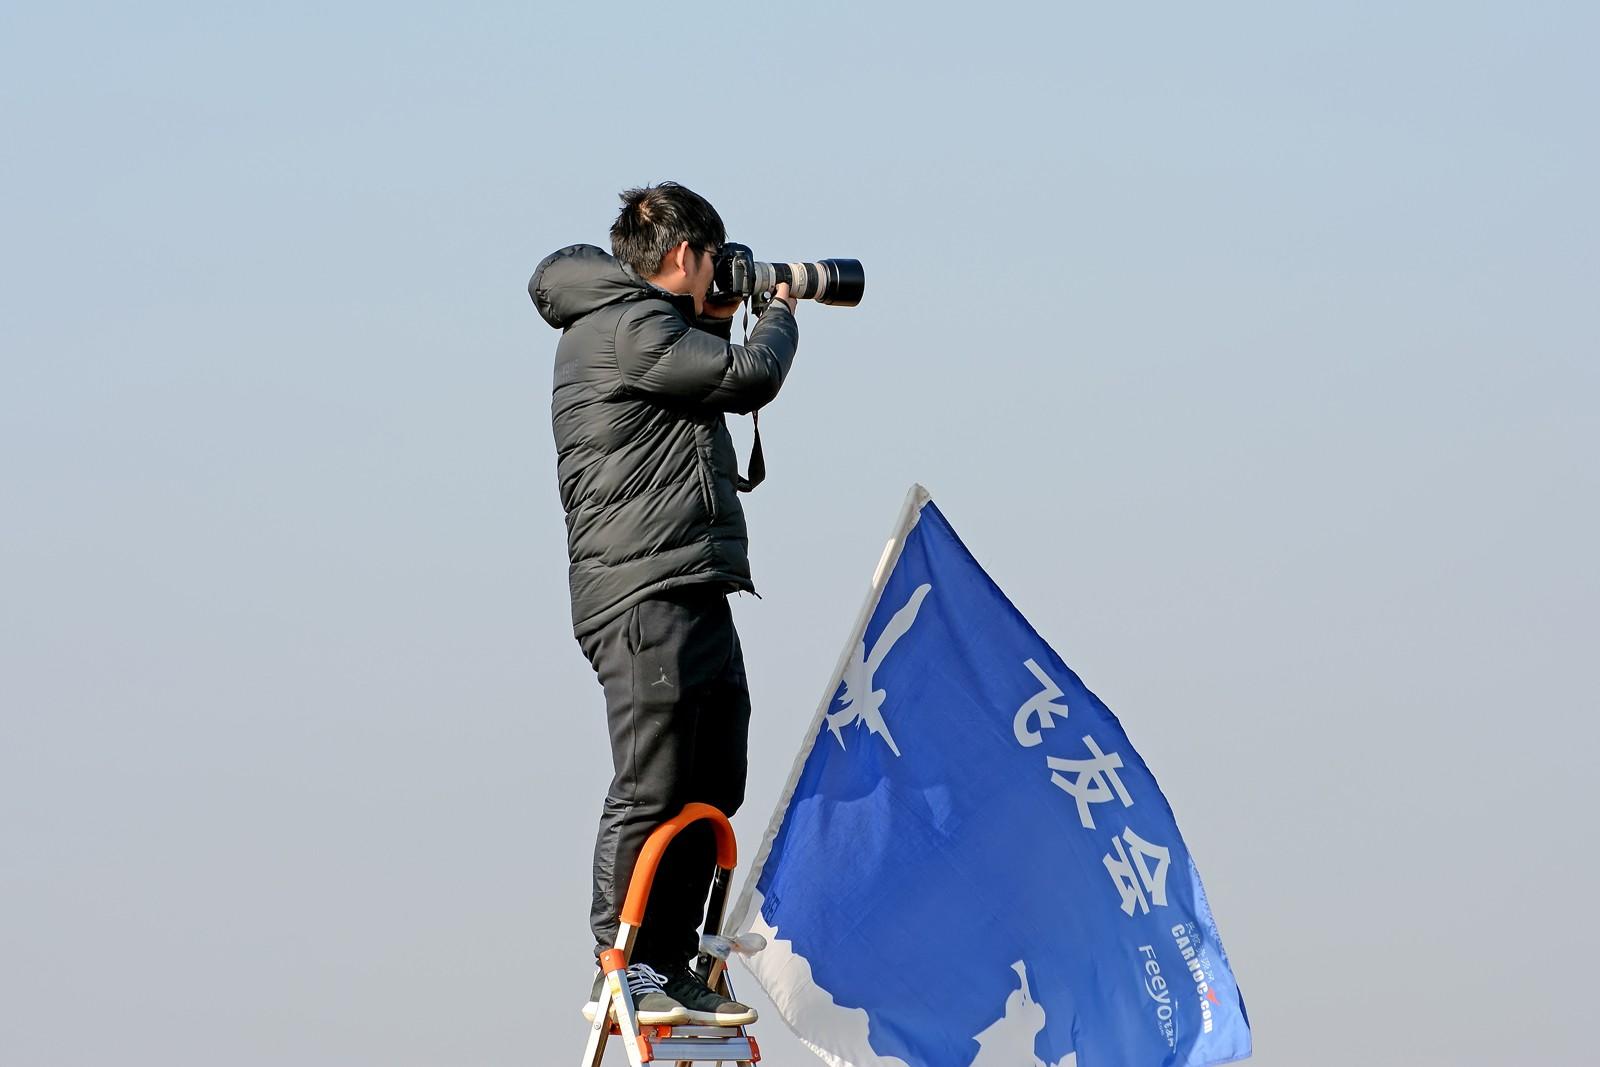 Re:[原创]【合肥飞友会】二〇一八年会相聚霸都新桥拍机活动队伍不断壮大中     飞友